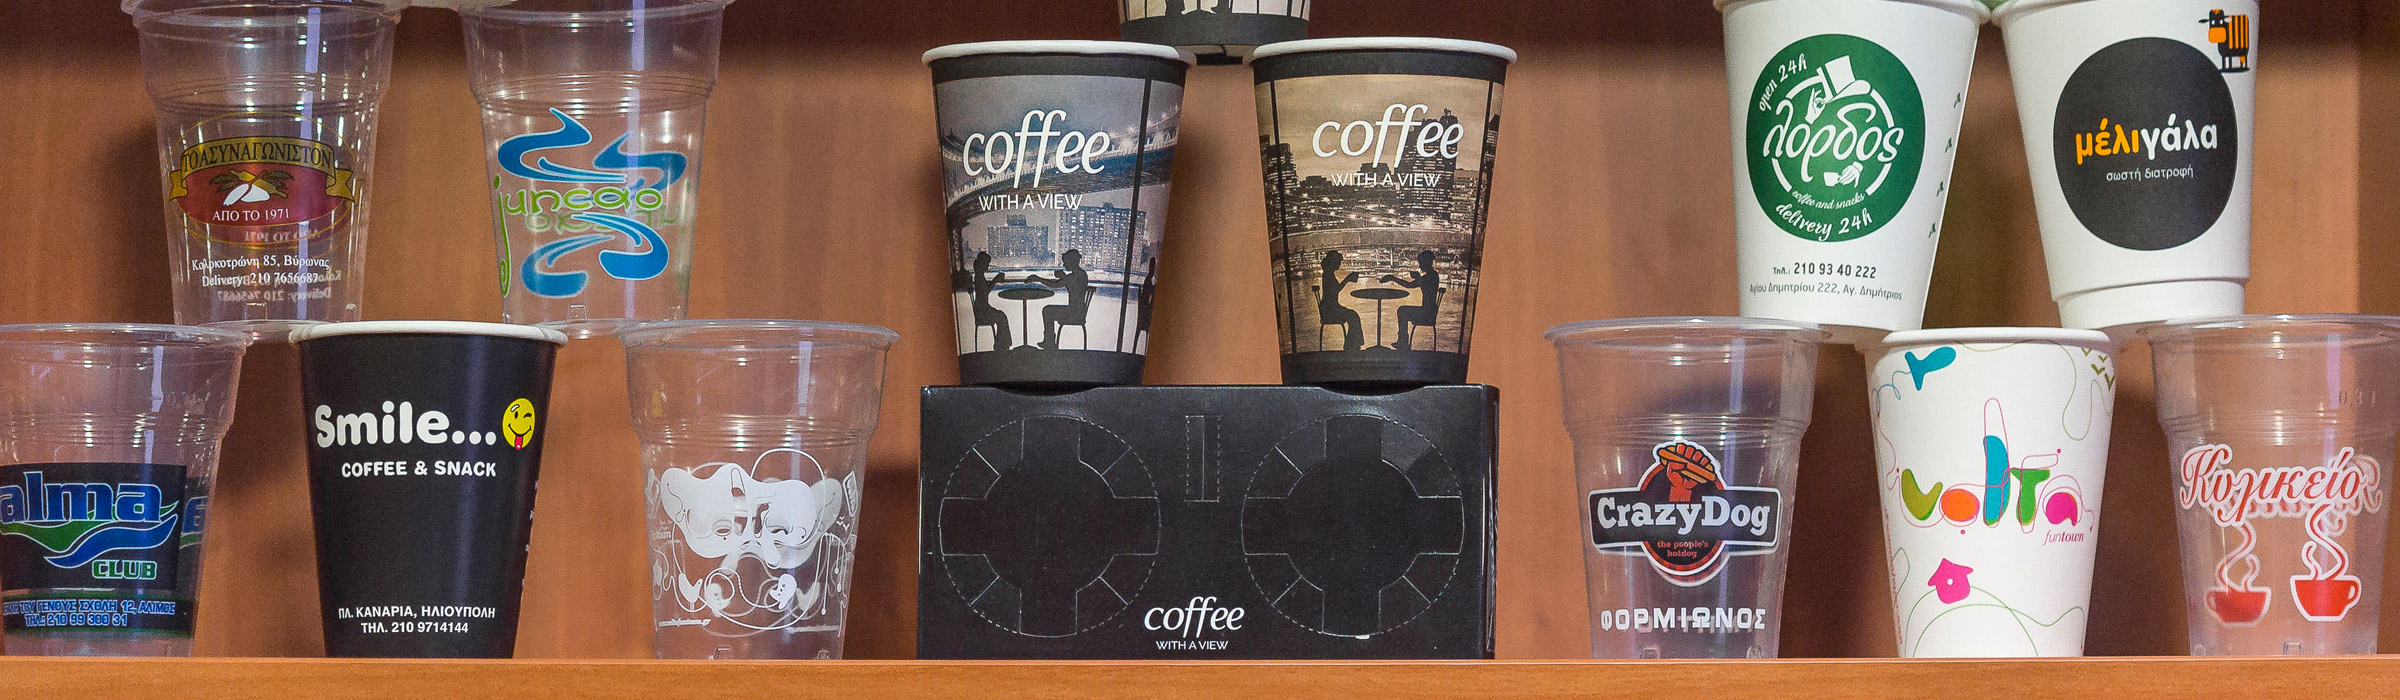 kfa papakonstantinou cups